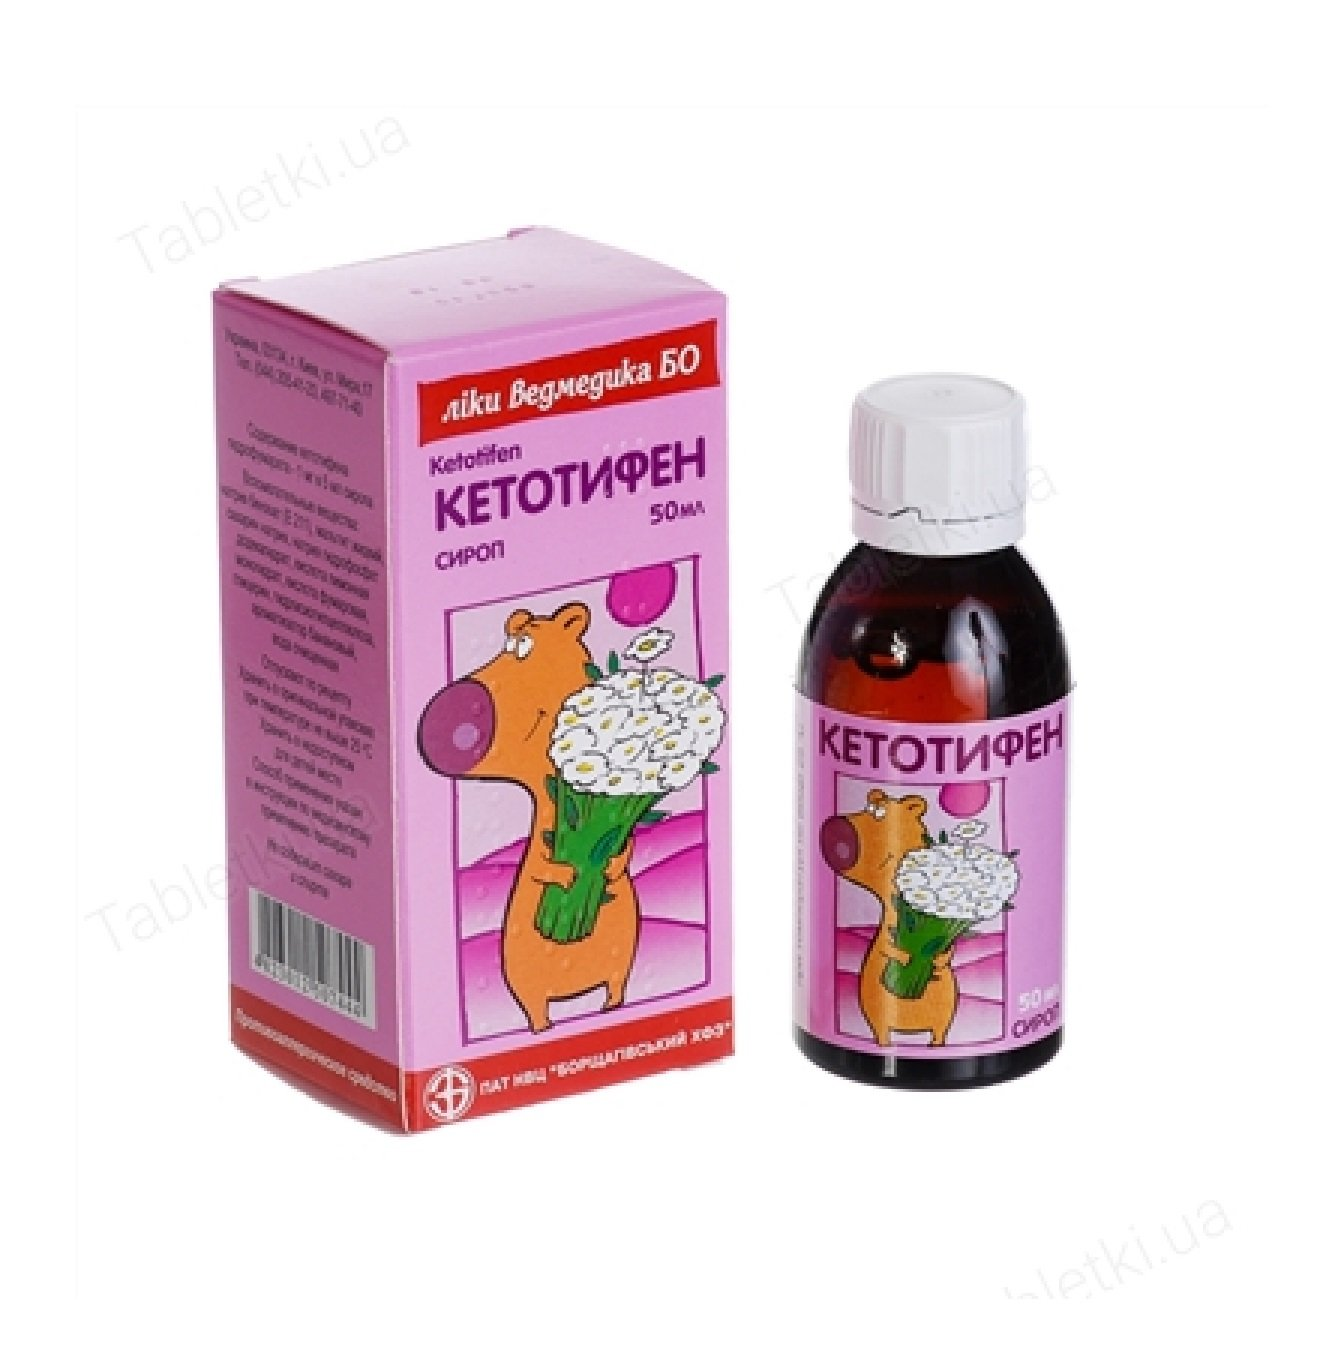 Ketotifen syrup 50 ml.